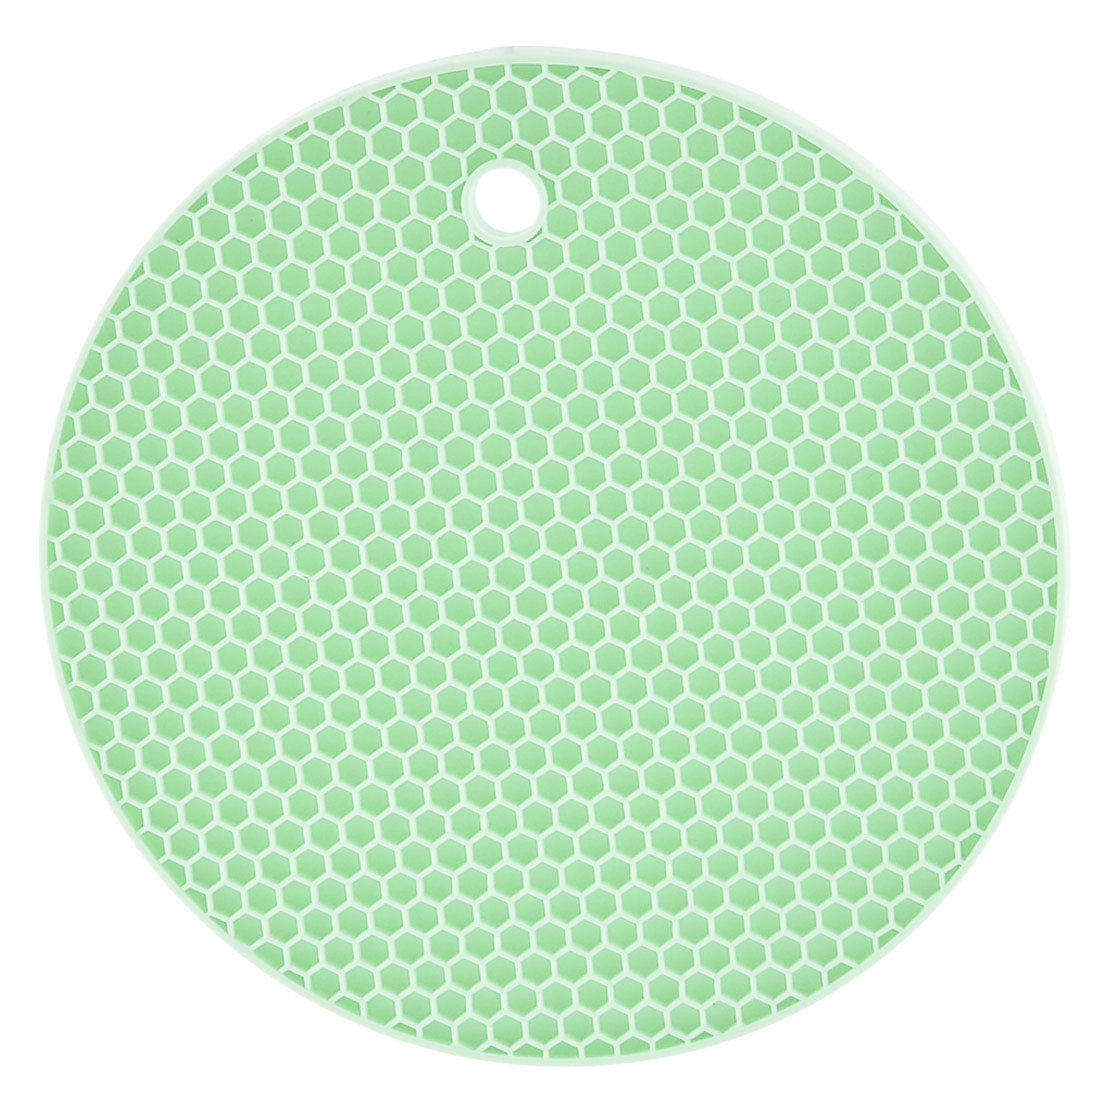 Household Round Shaped Nonslip Heat Insulated Hot Pot Mat Pad Holder Cyan